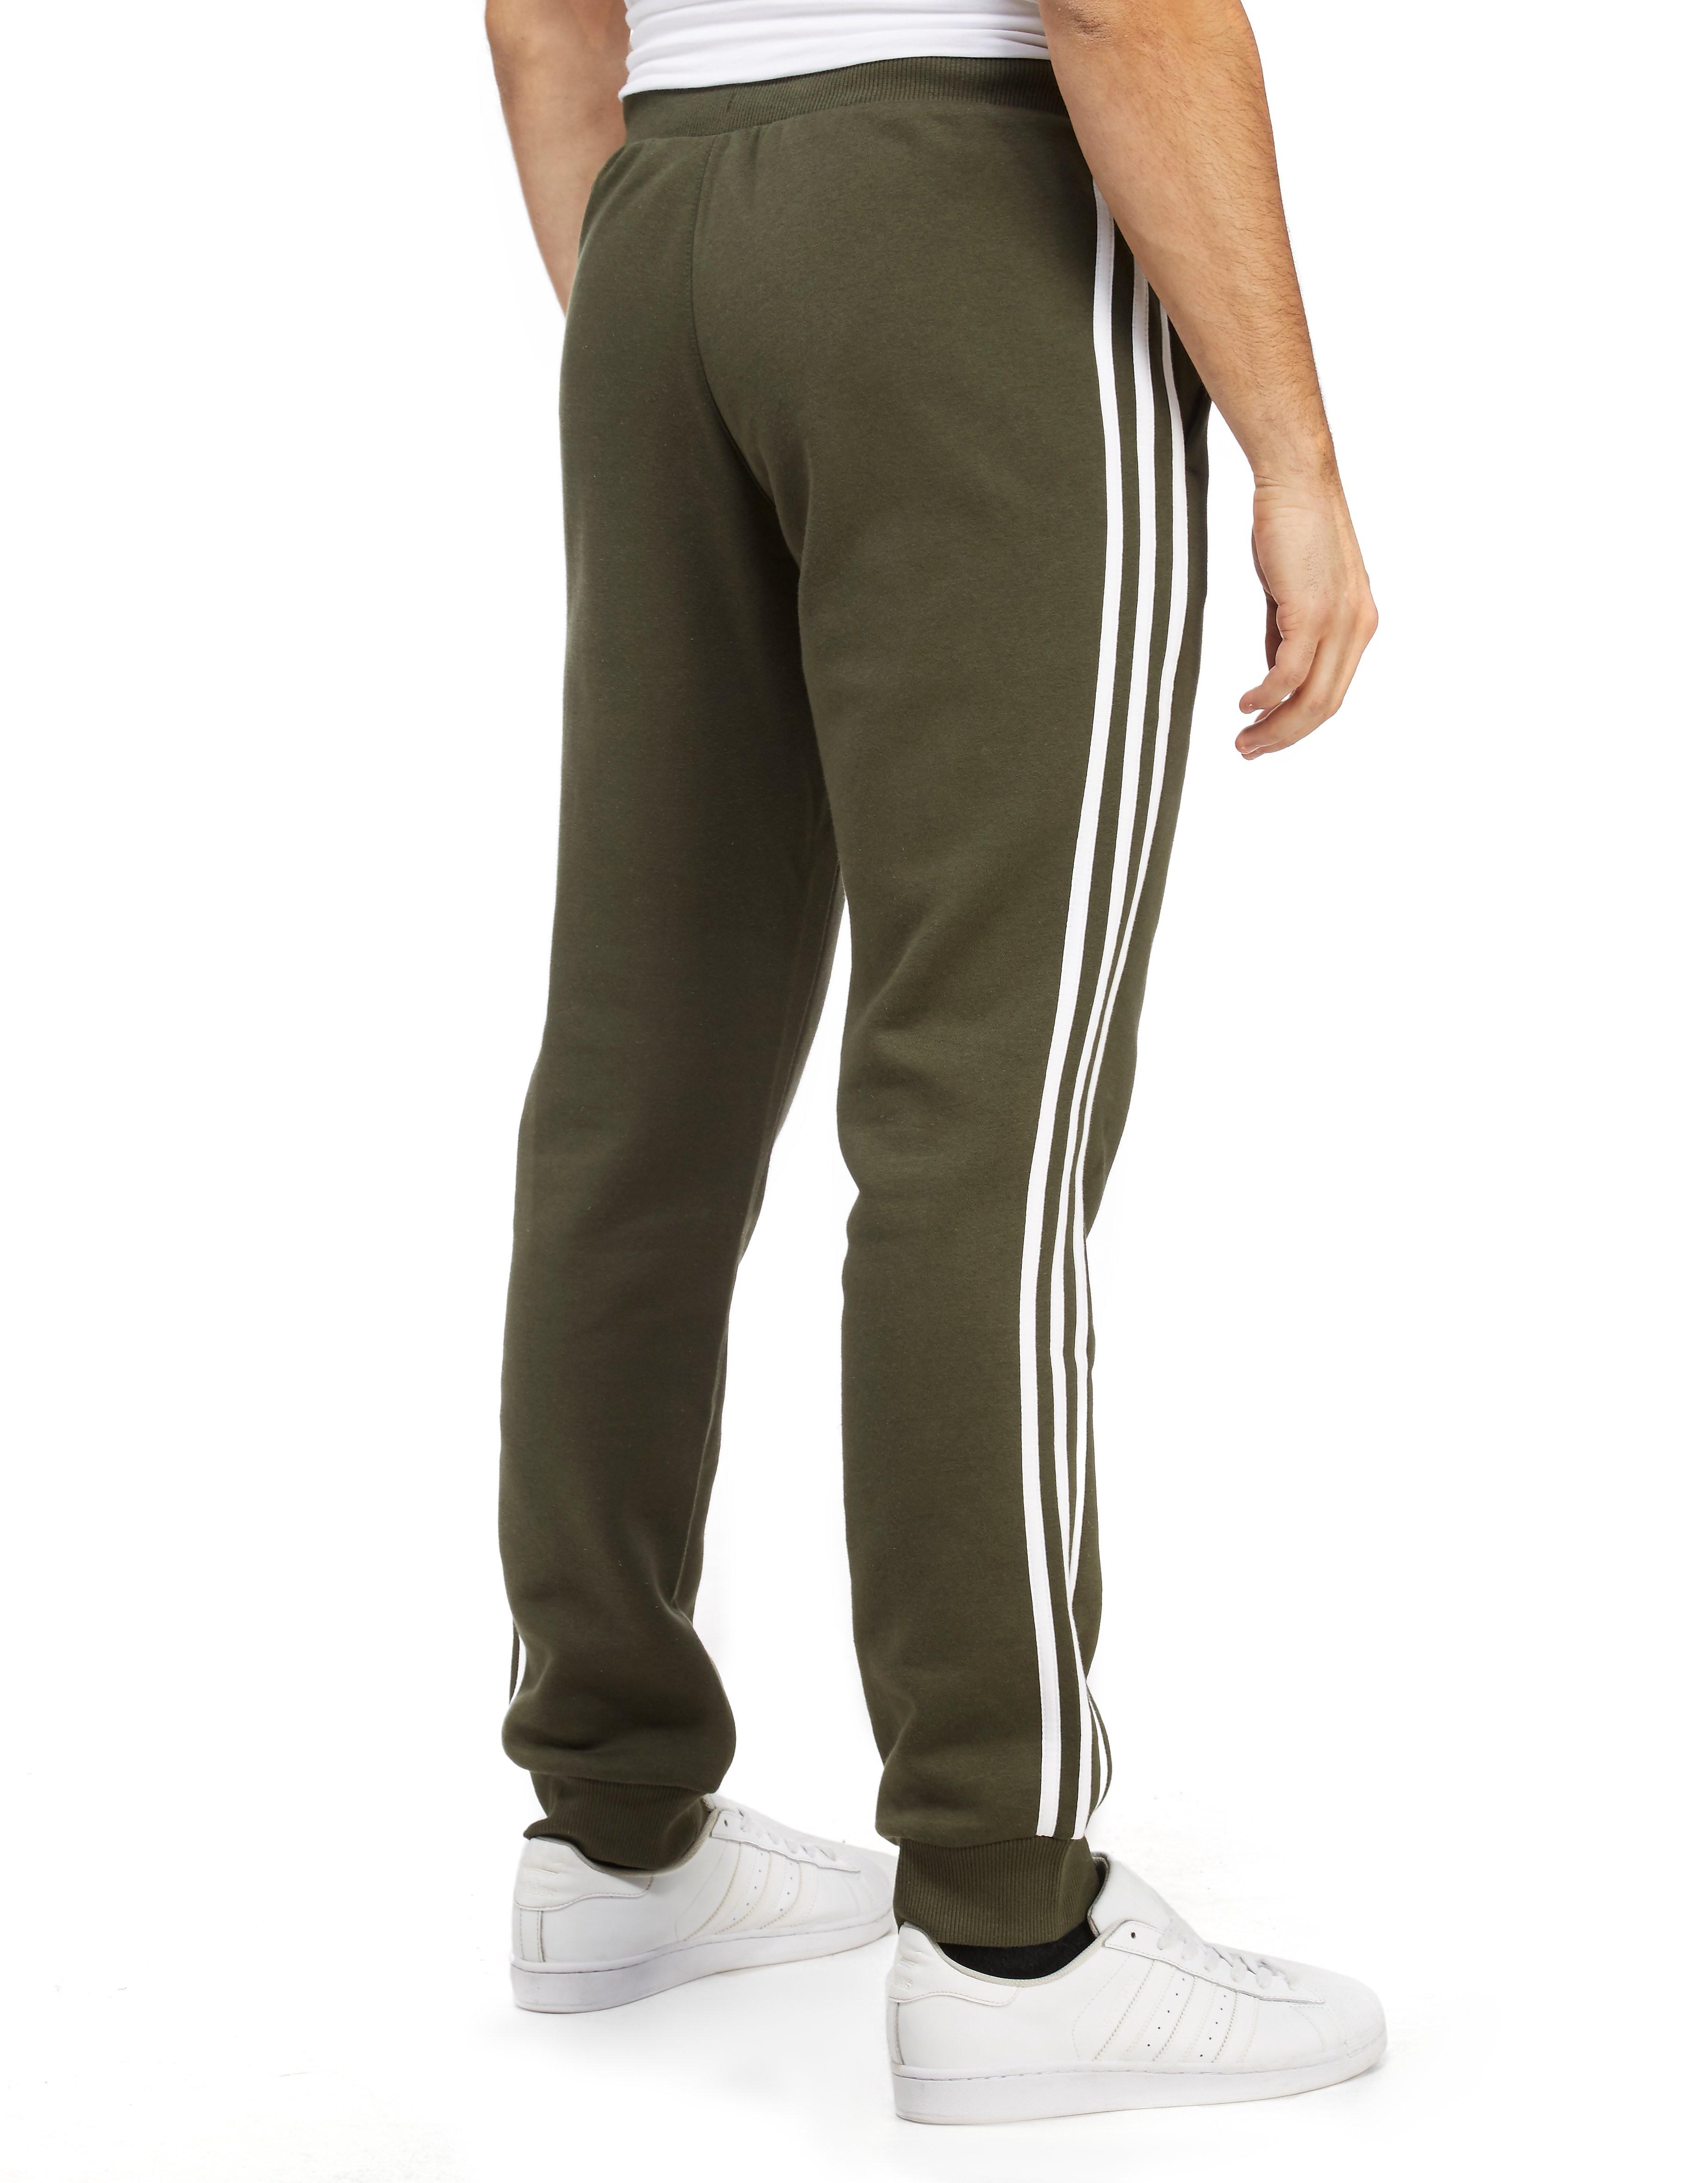 adidas Originals Trefoil Cuff Pants